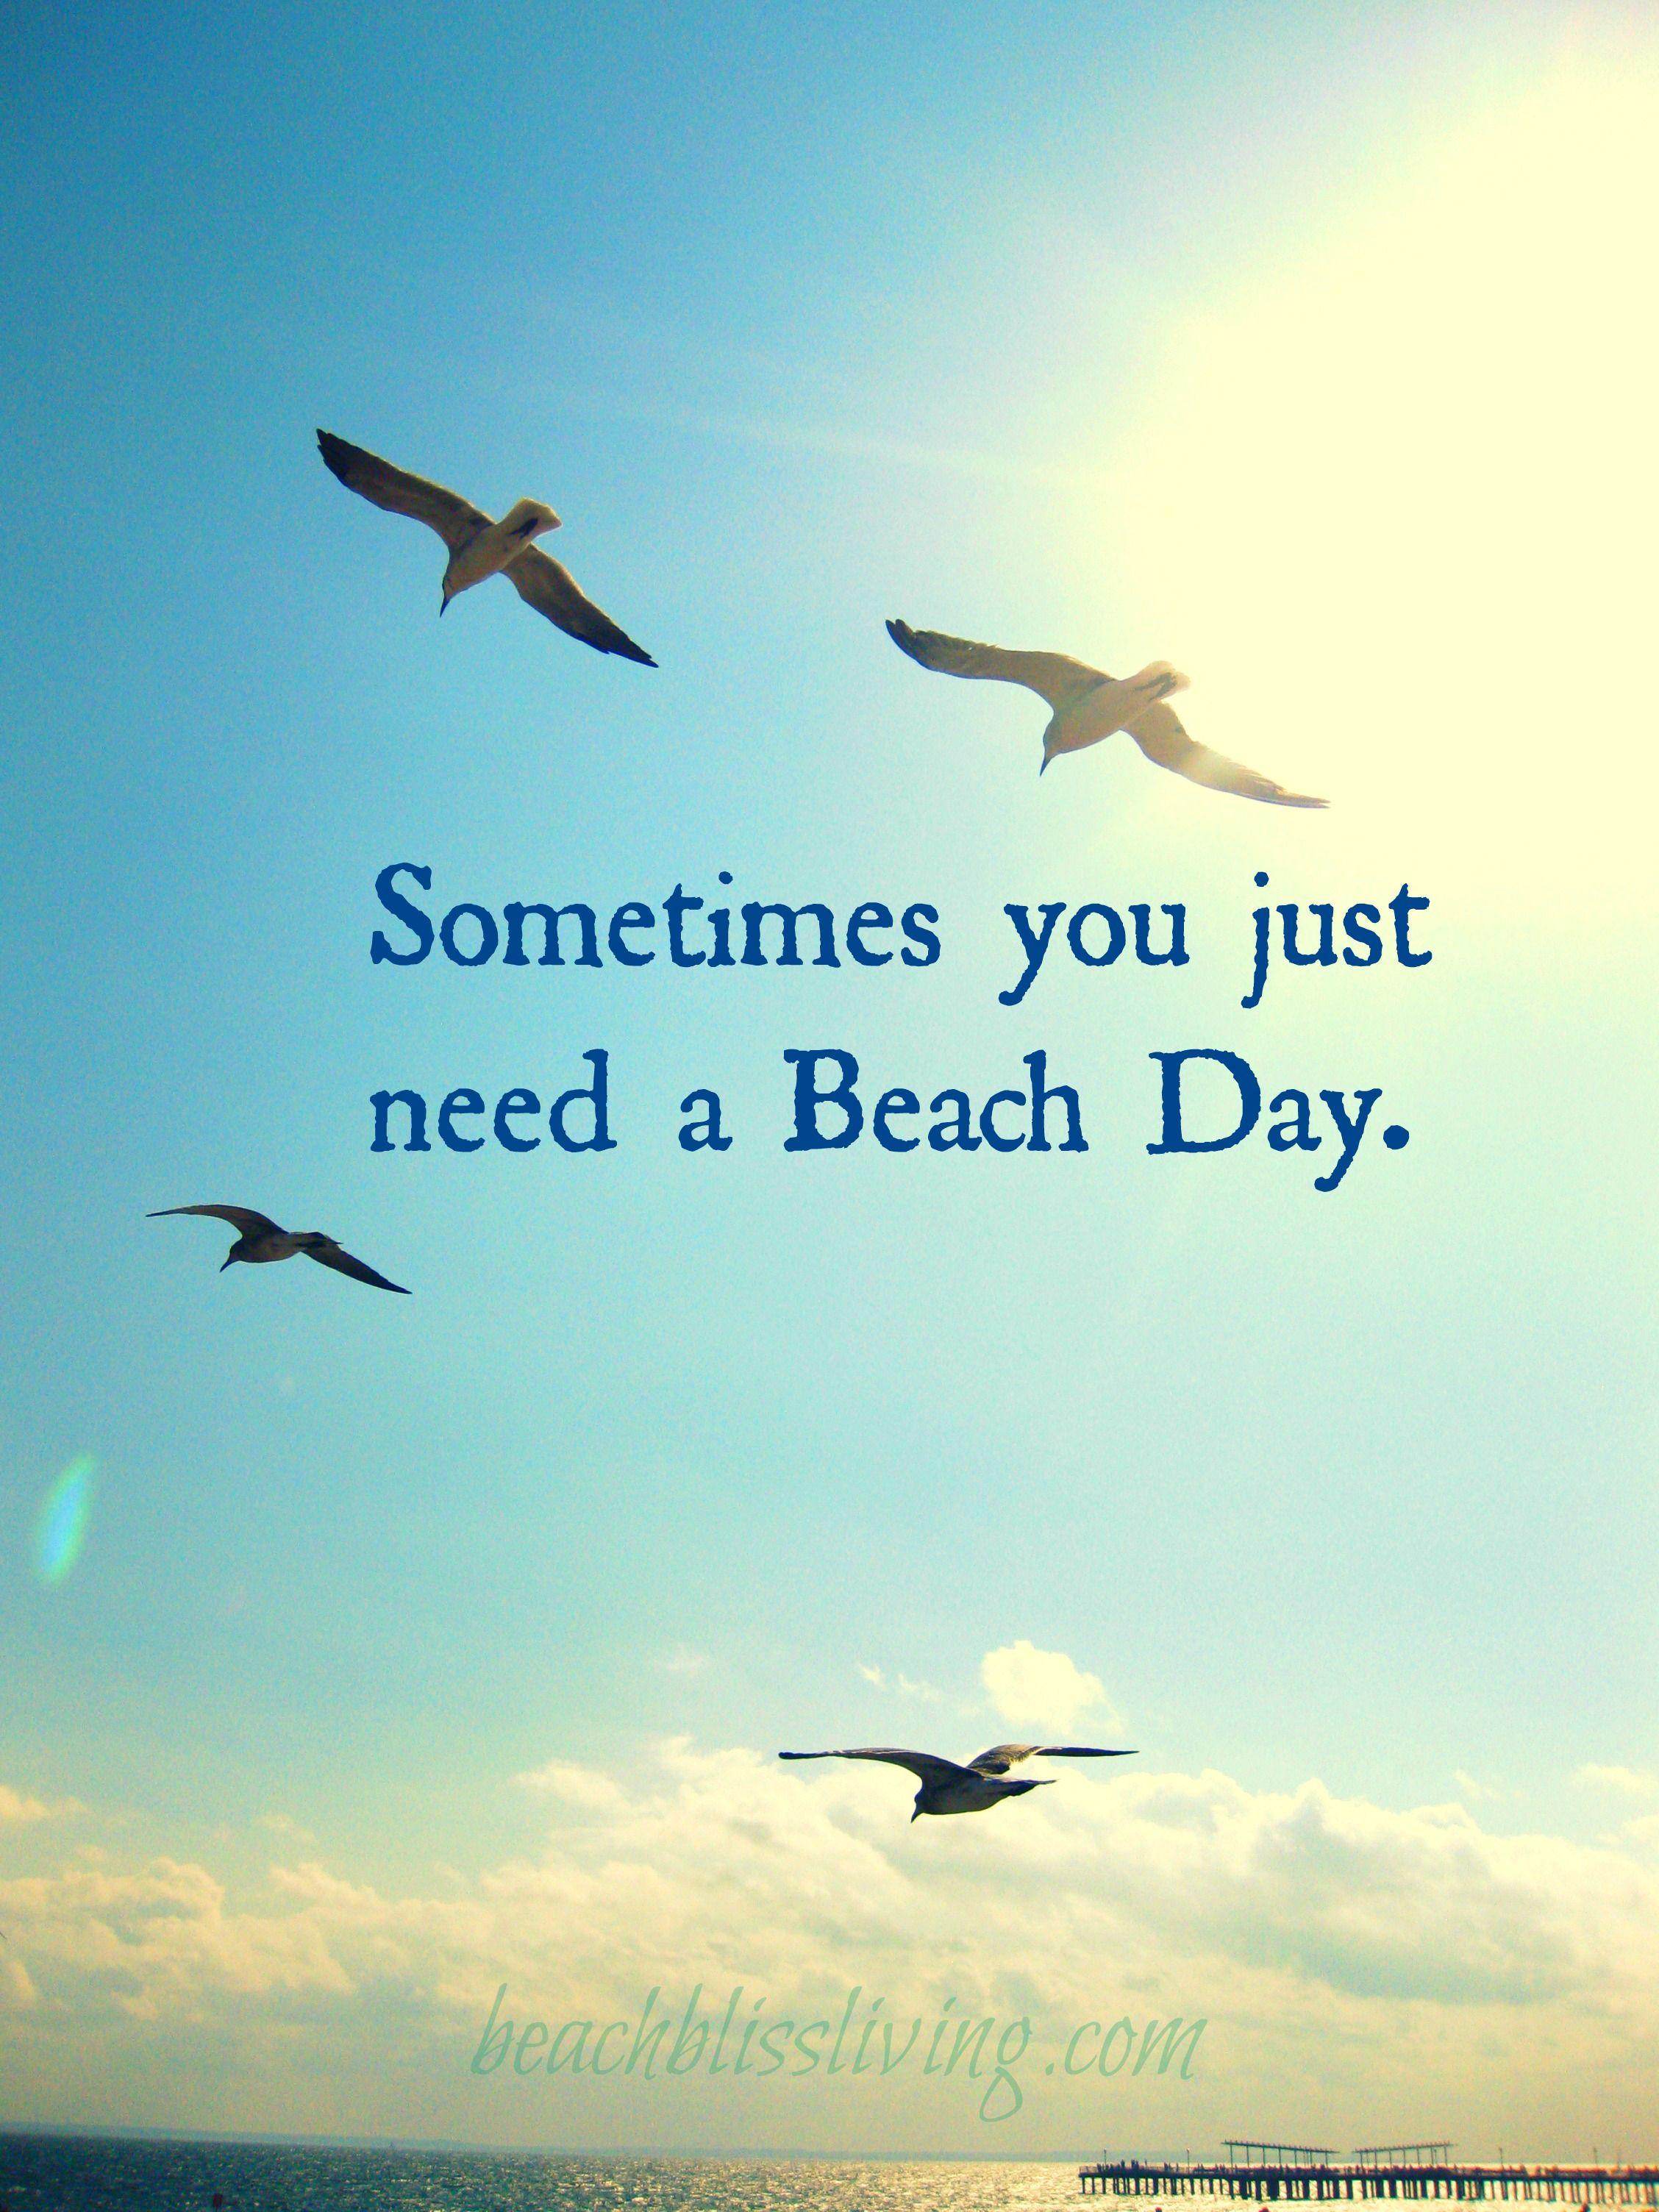 Sometimes you just need a Beach Day. Coney Island New York: https://www.facebook.com/CoastalBeachBlissLiving/photos/a.128908803835246.19702.128847517174708/772642926128494/?type=1&theater